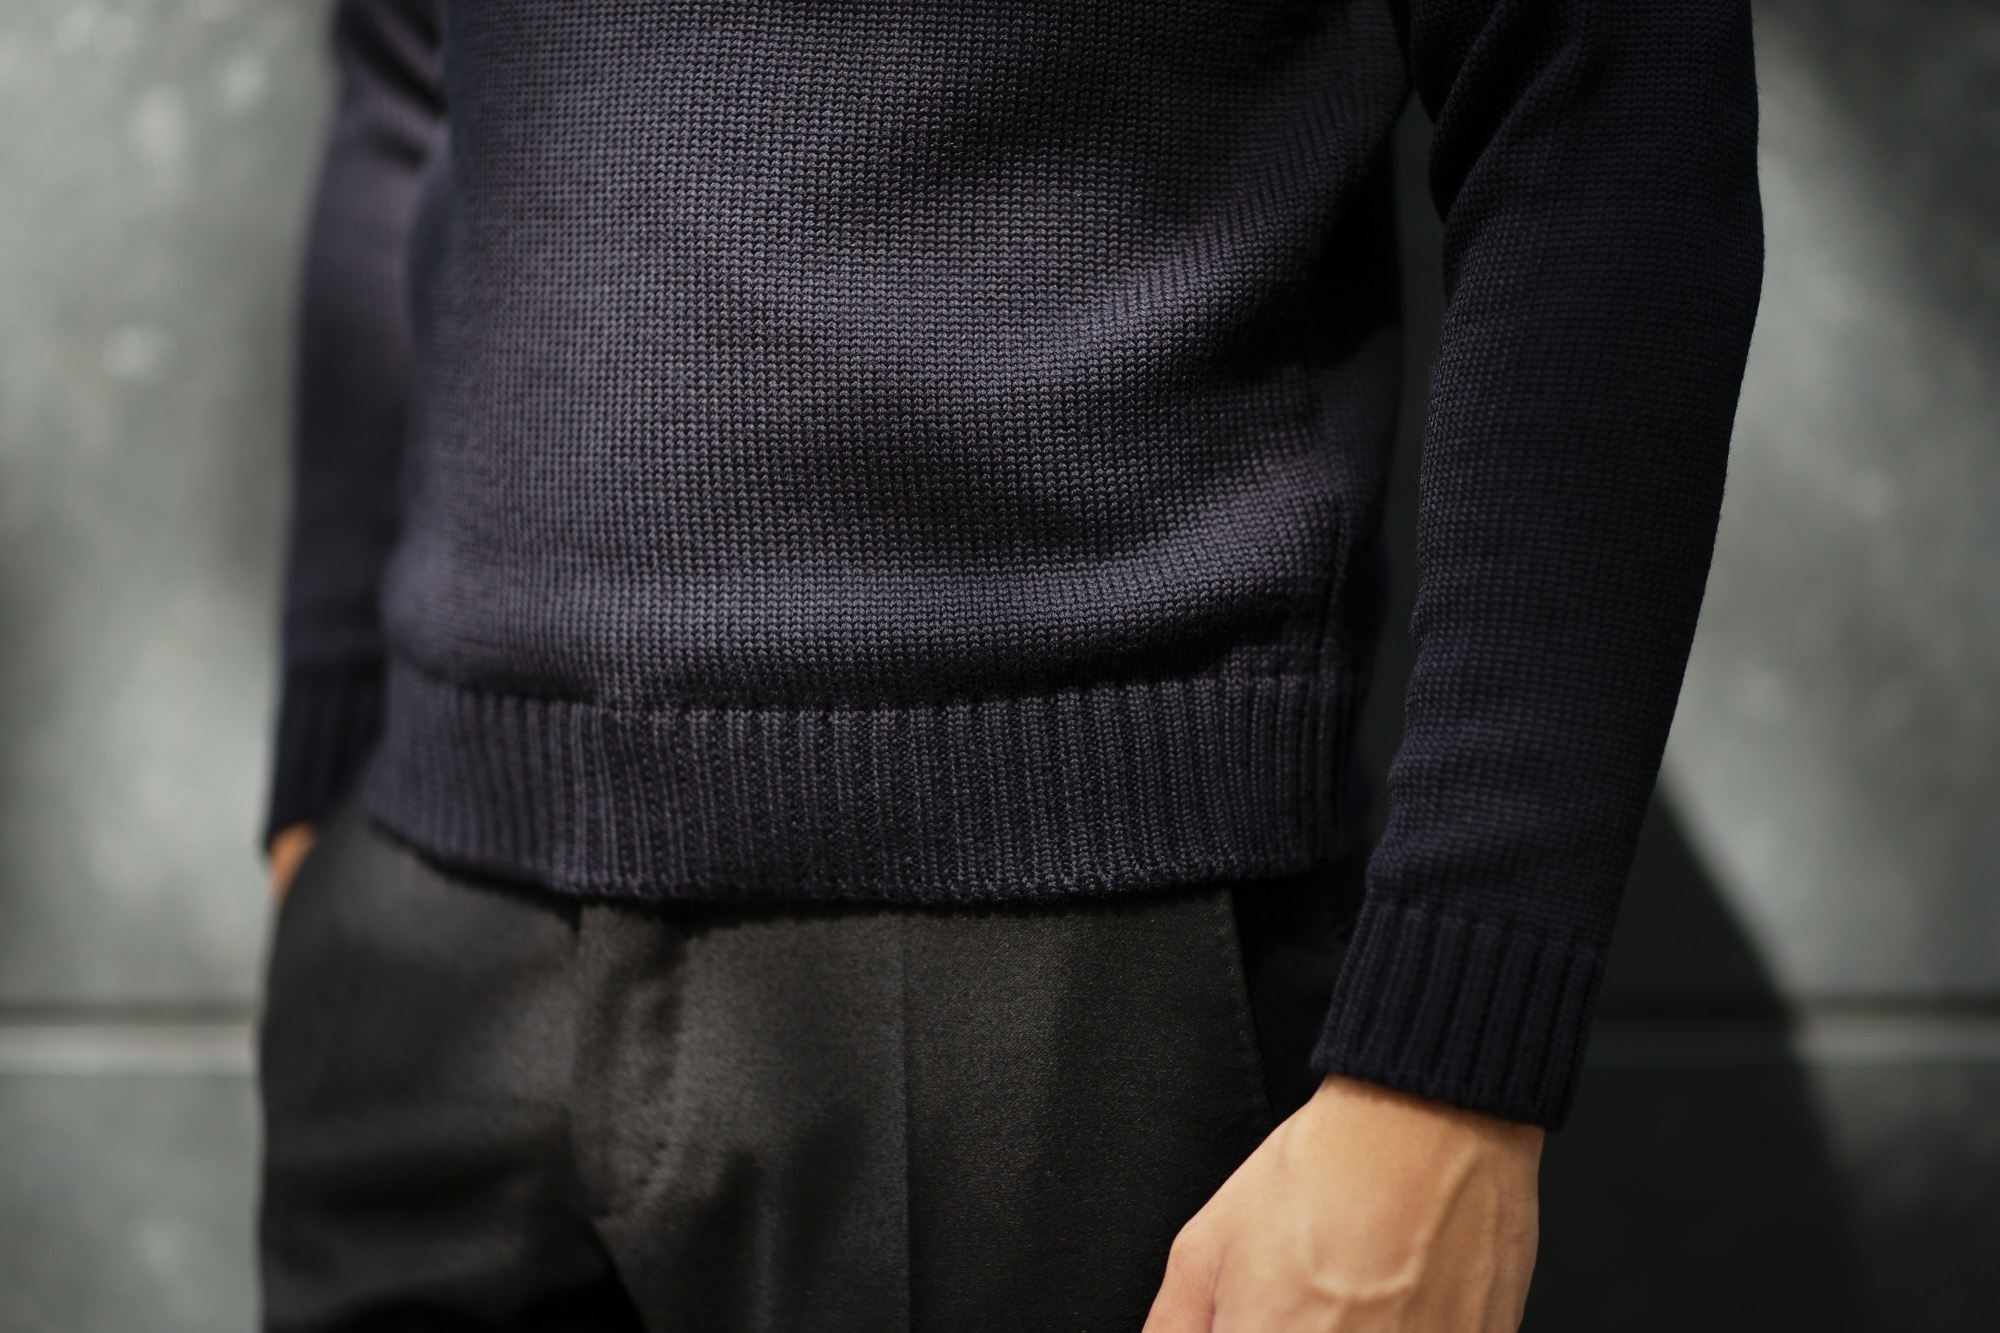 ZANONE (ザノーネ) Turtle Neck Sweater (タートルネックセーター) 810005 Z0229 VIRGIN WOOL 100% ミドルゲージ ウールニット セーター NAVY (ネイビー・Z1375) made in italy (イタリア製) 2019 秋冬 【ご予約受付中】zanone ニット クルーネック 愛知 名古屋 Alto e Diritto アルト エ デリット